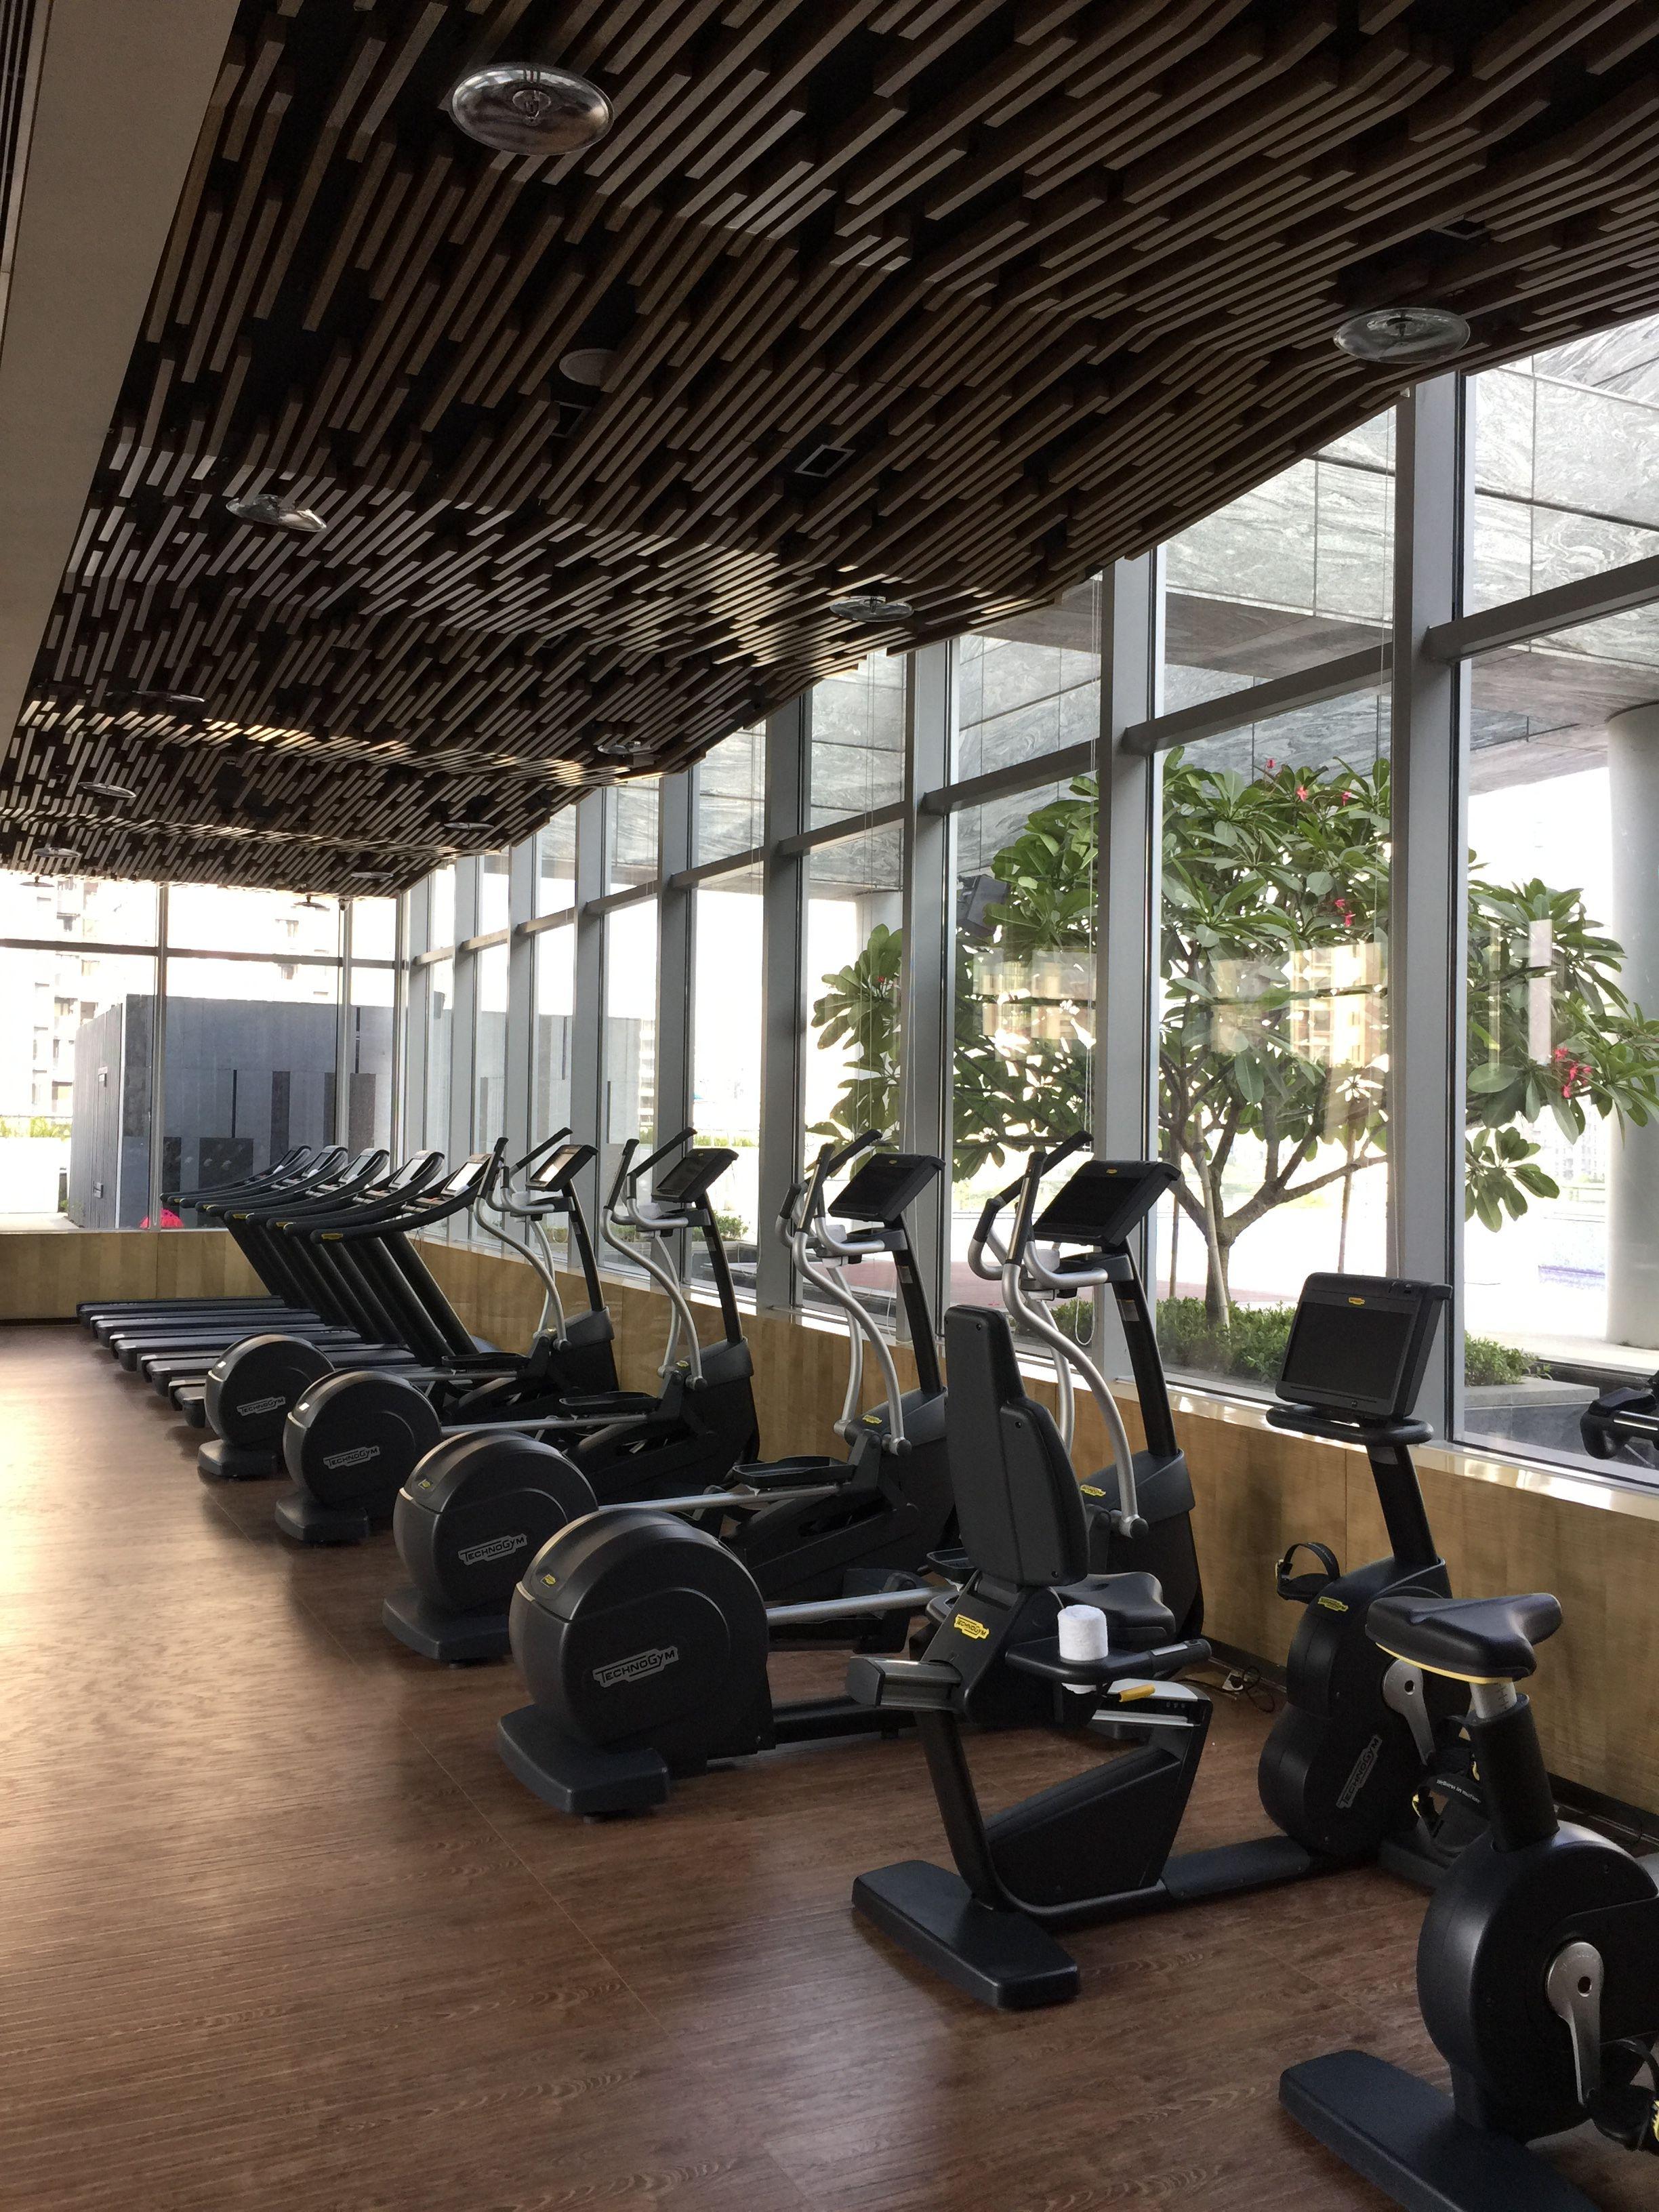 Fitness Gym Gym Workouts Gym Pool Area